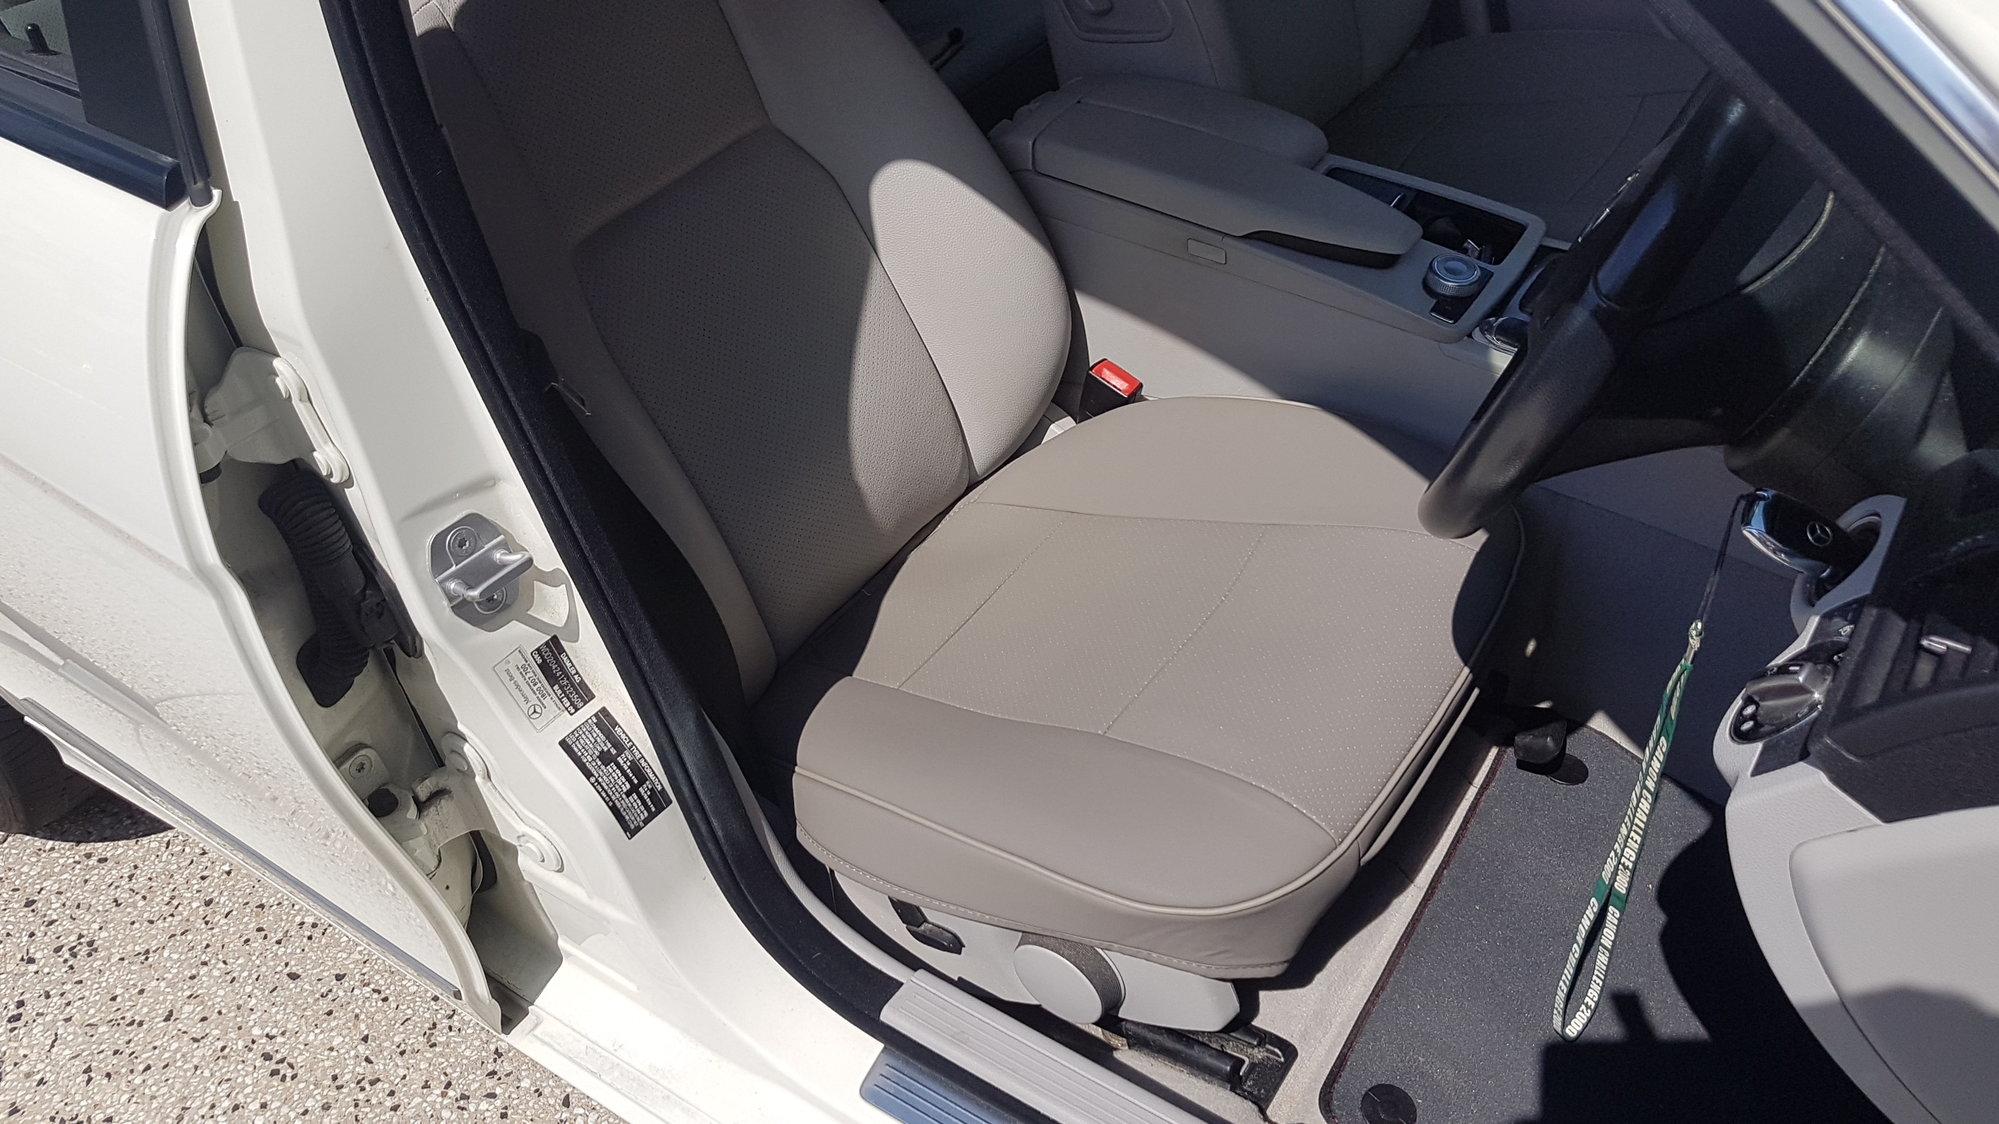 Driver seat cracking - MBWorld org Forums